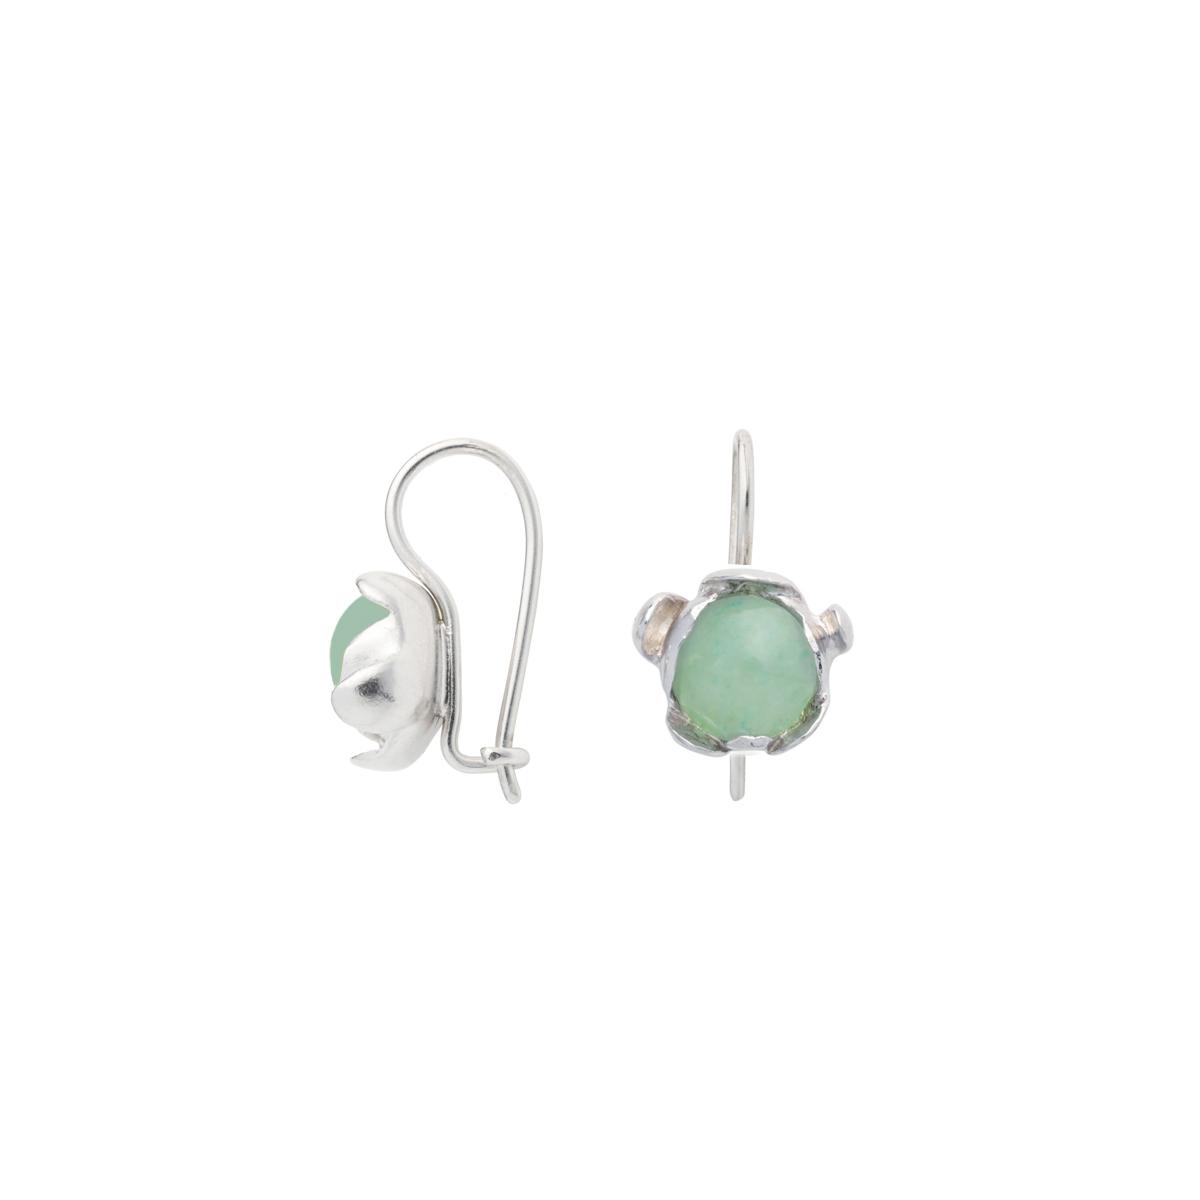 BLOSSOM hook earrings with green aventurine